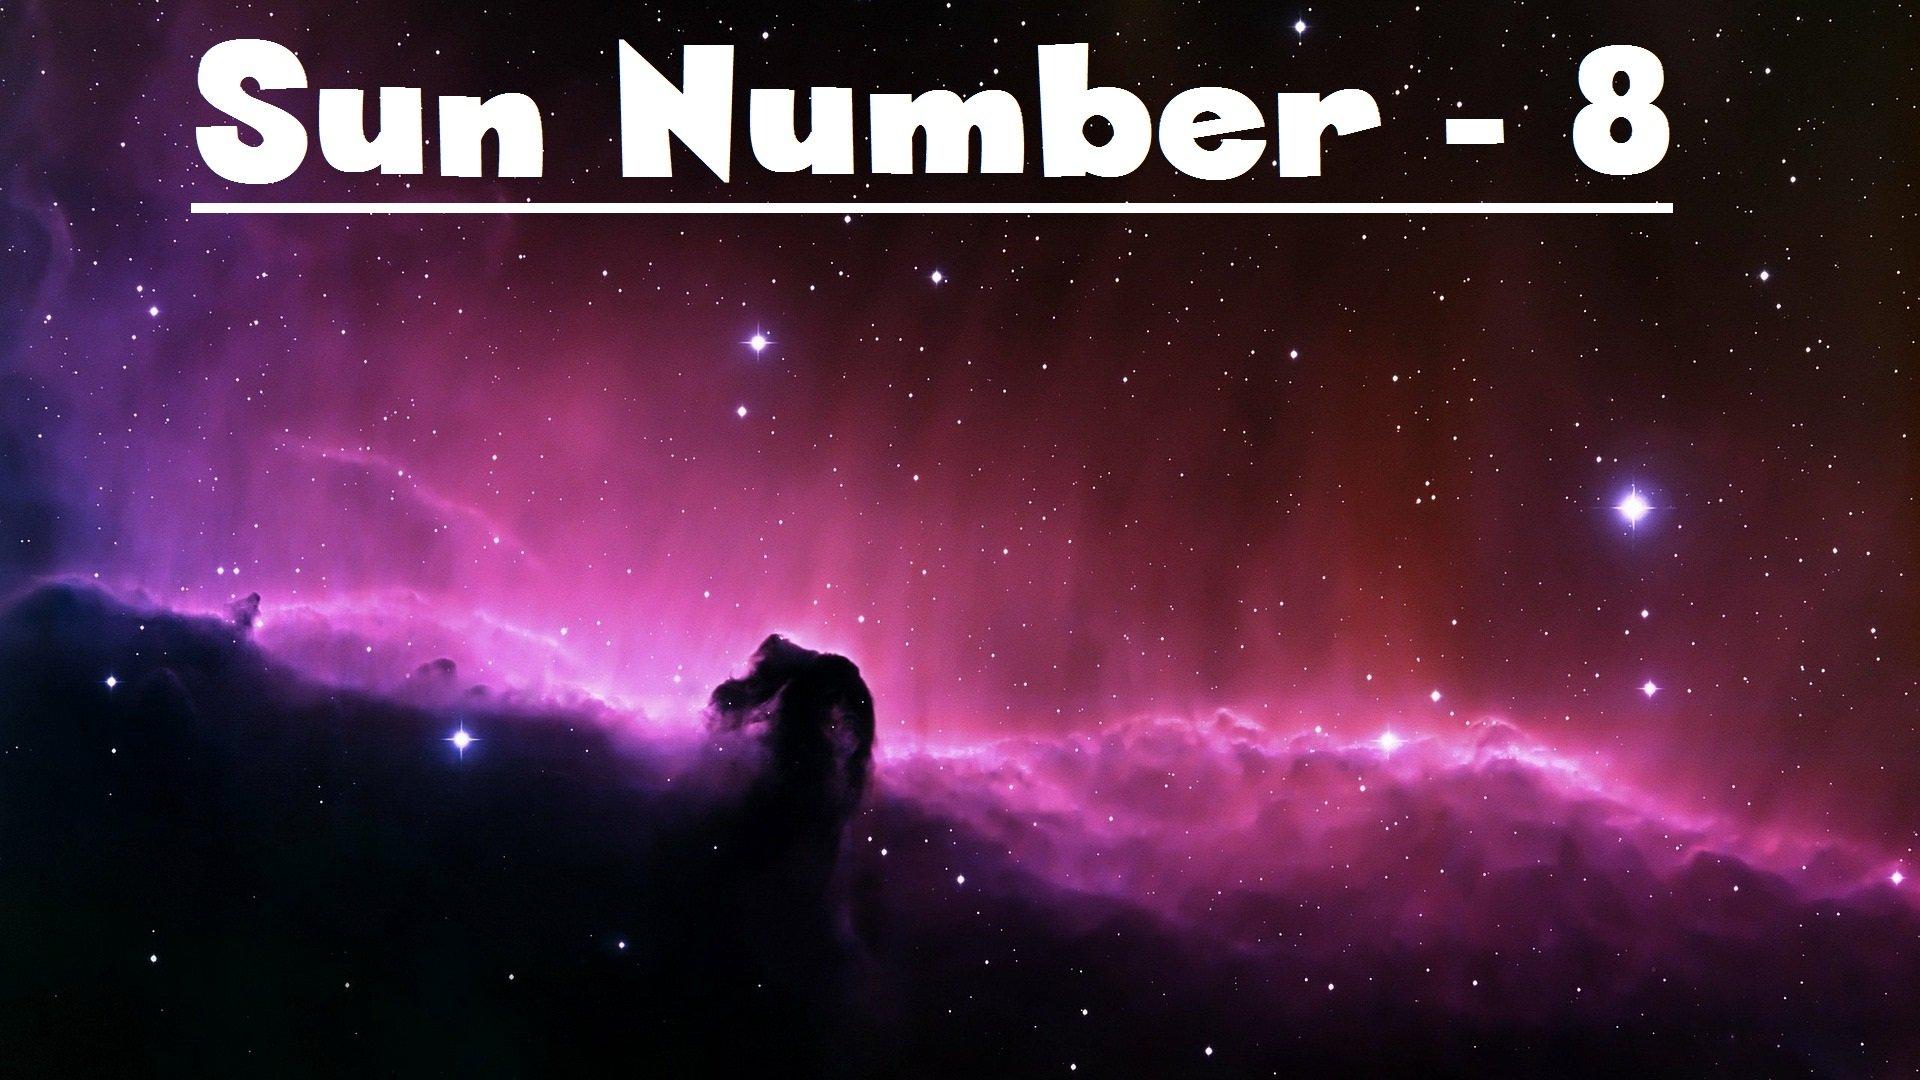 Sun number -8